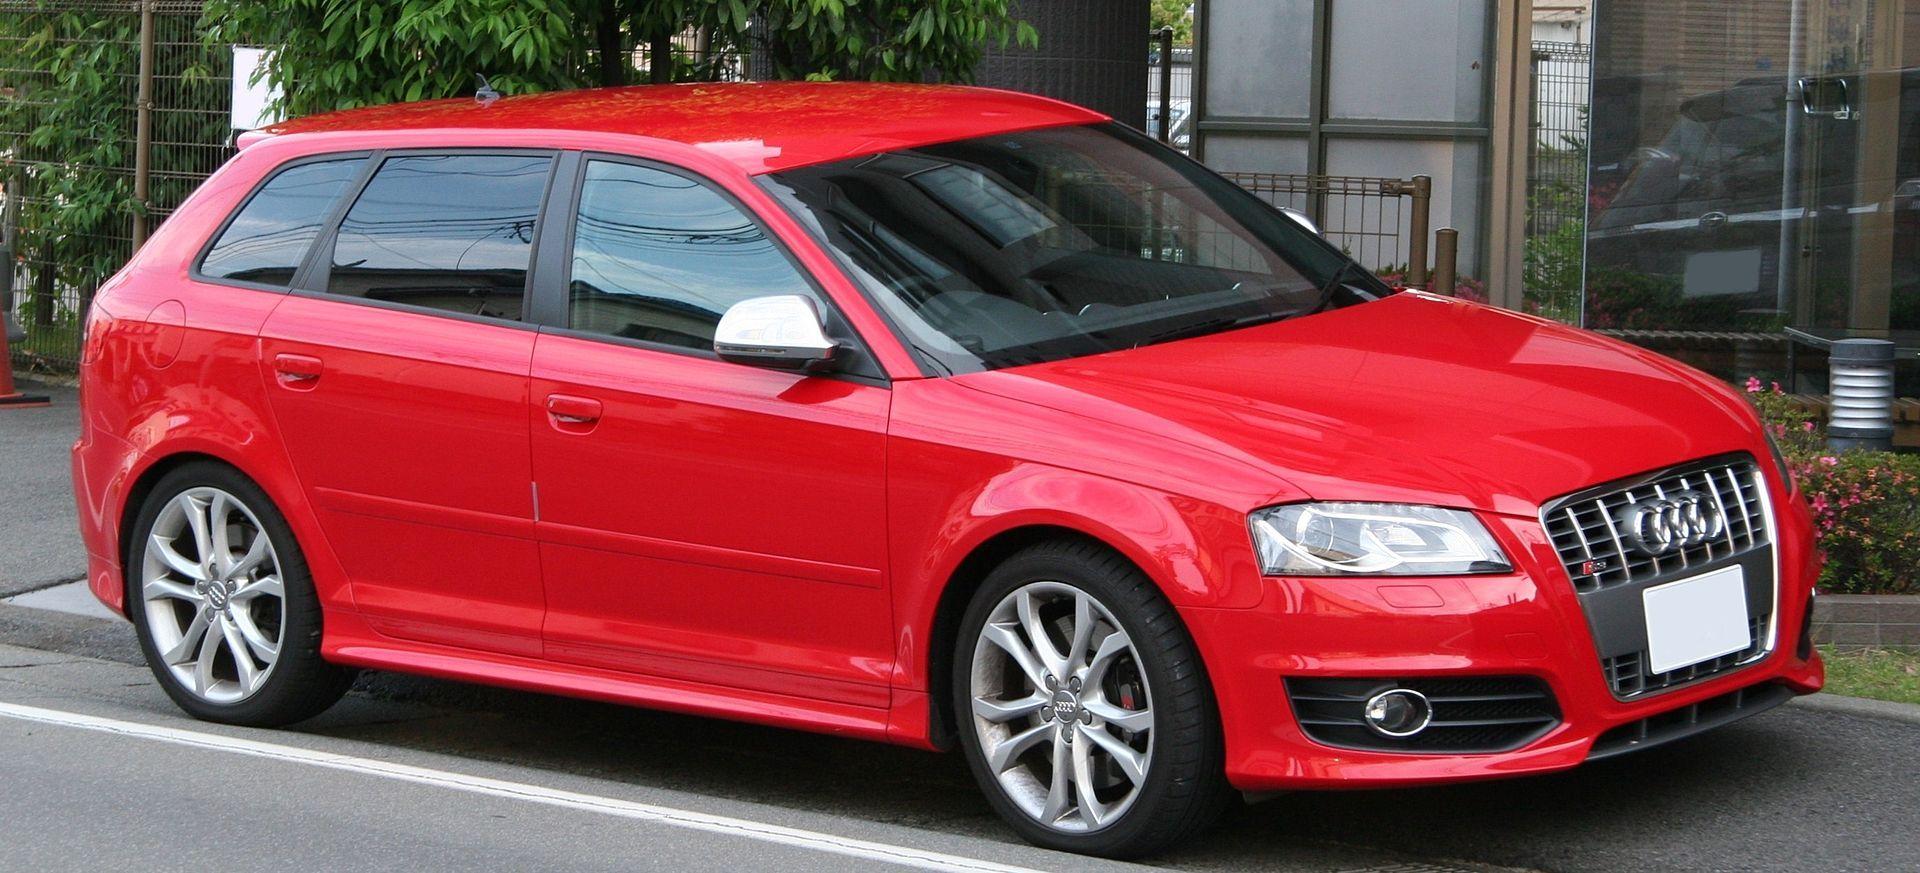 Audi s3 sportback audi a3 wikipedia